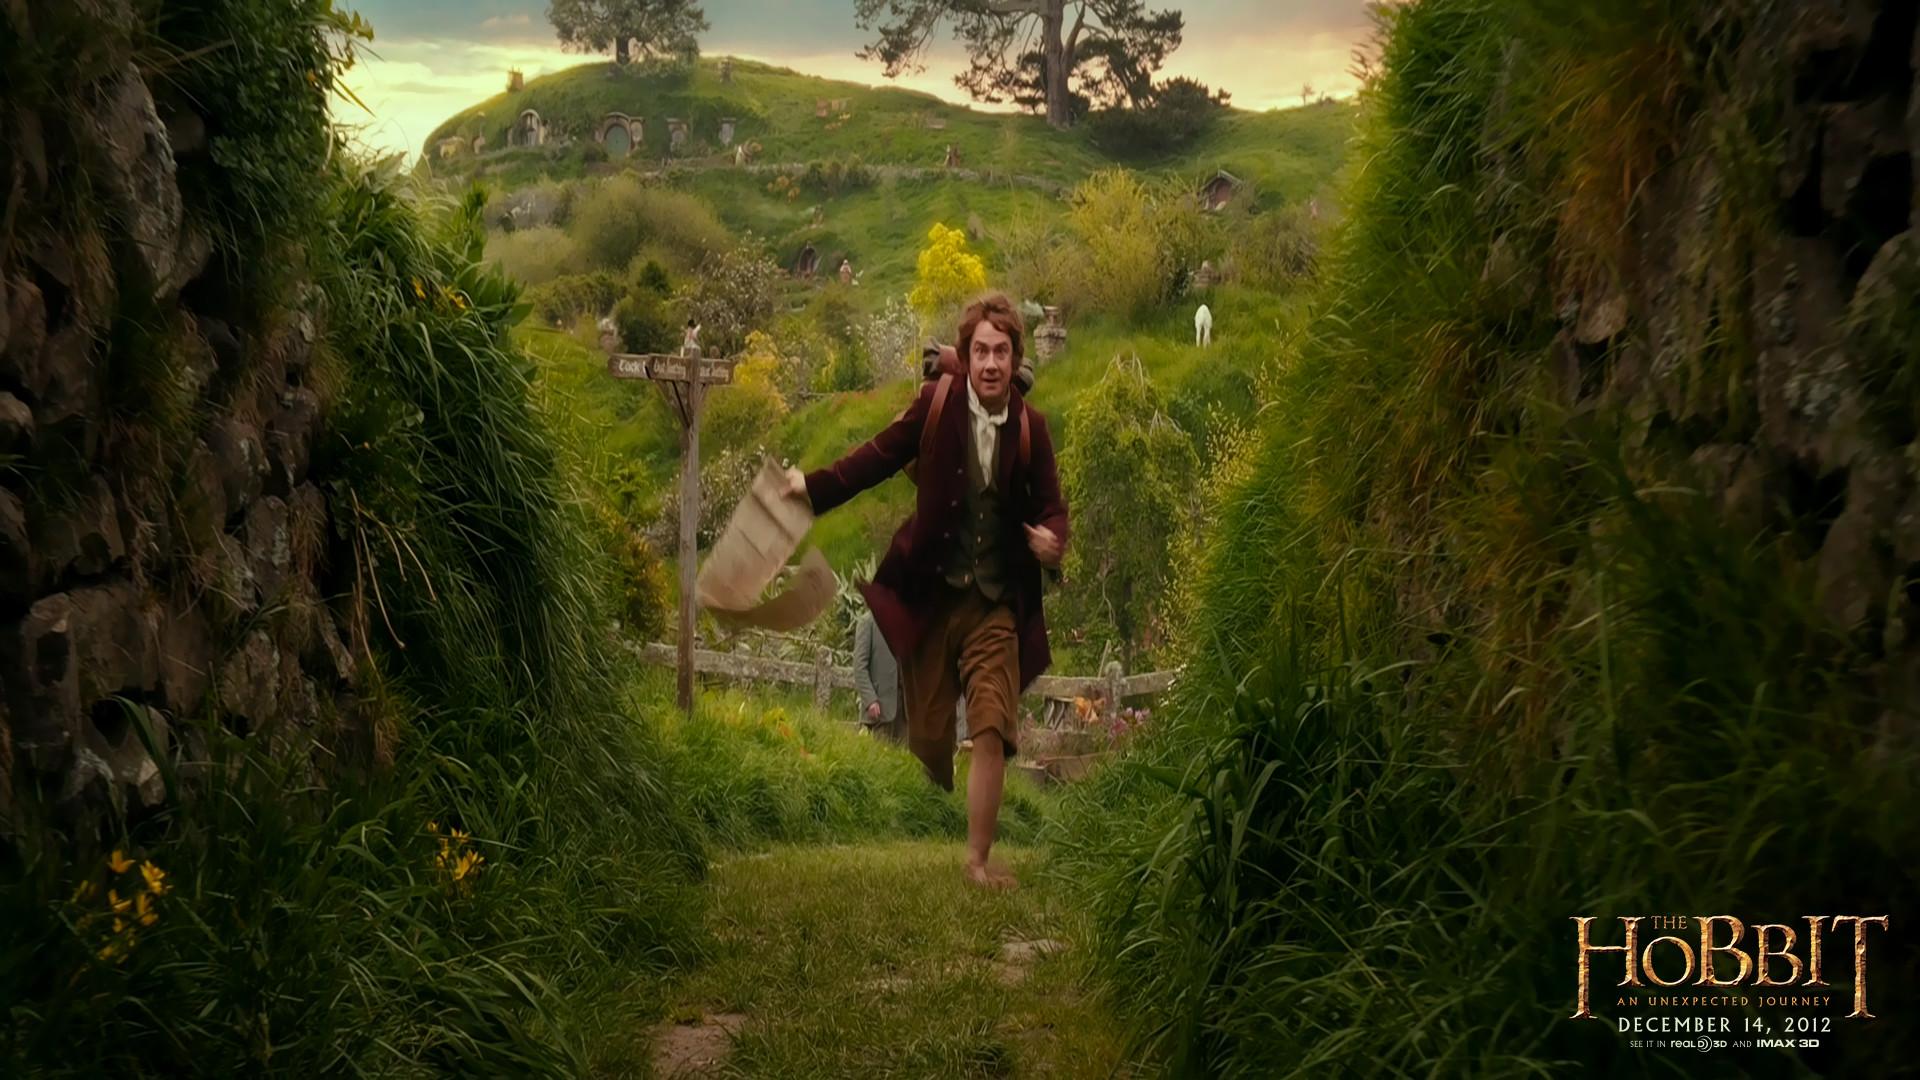 The Hobbit Bilbo High Quality Wallpaper – Mbagusi.com